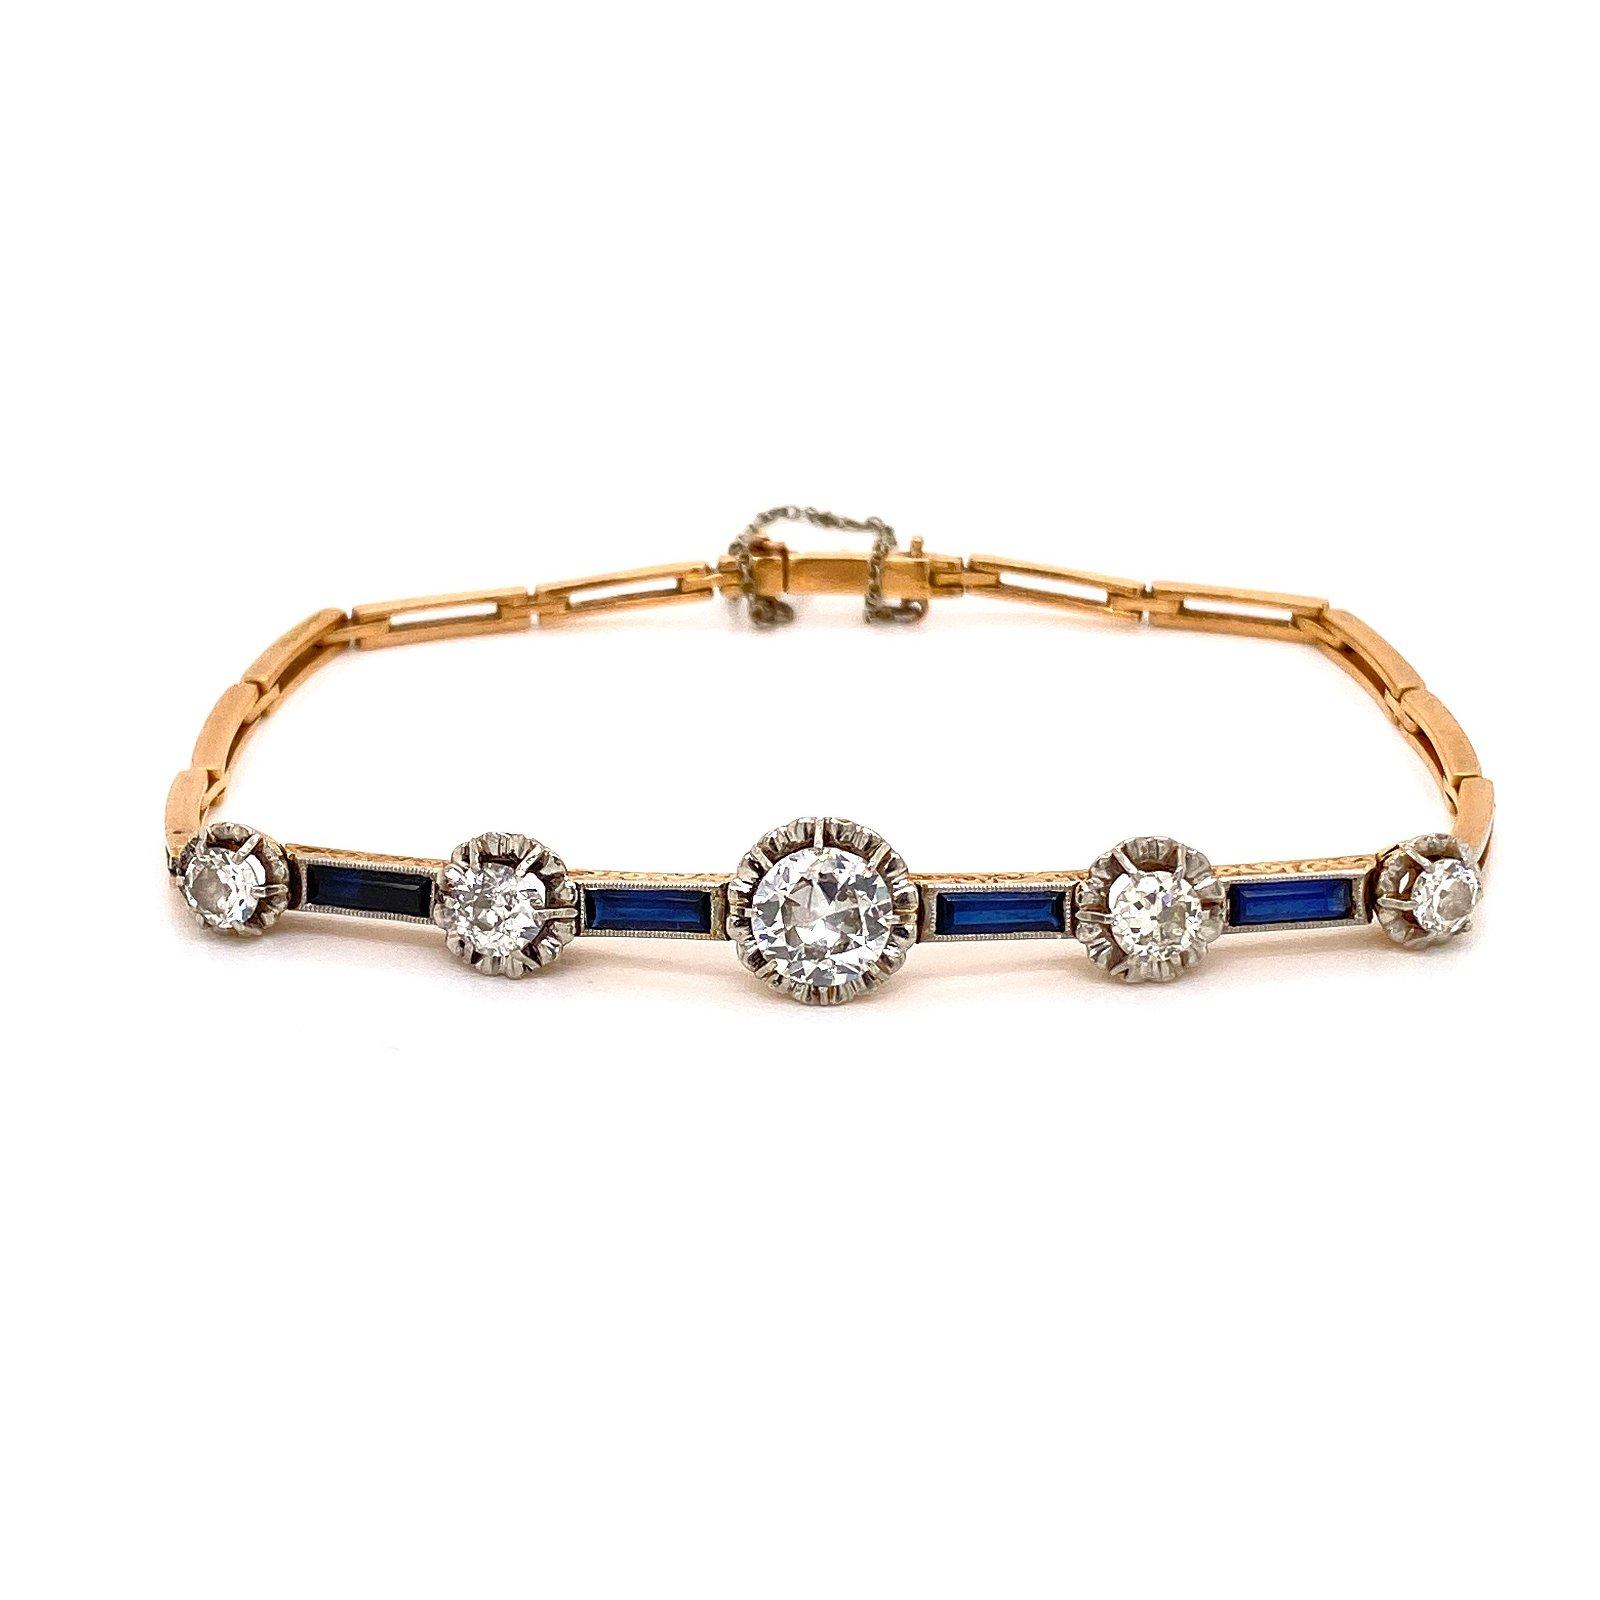 18k Gold, Platinum, Sapphire & Diamonds Bracelet